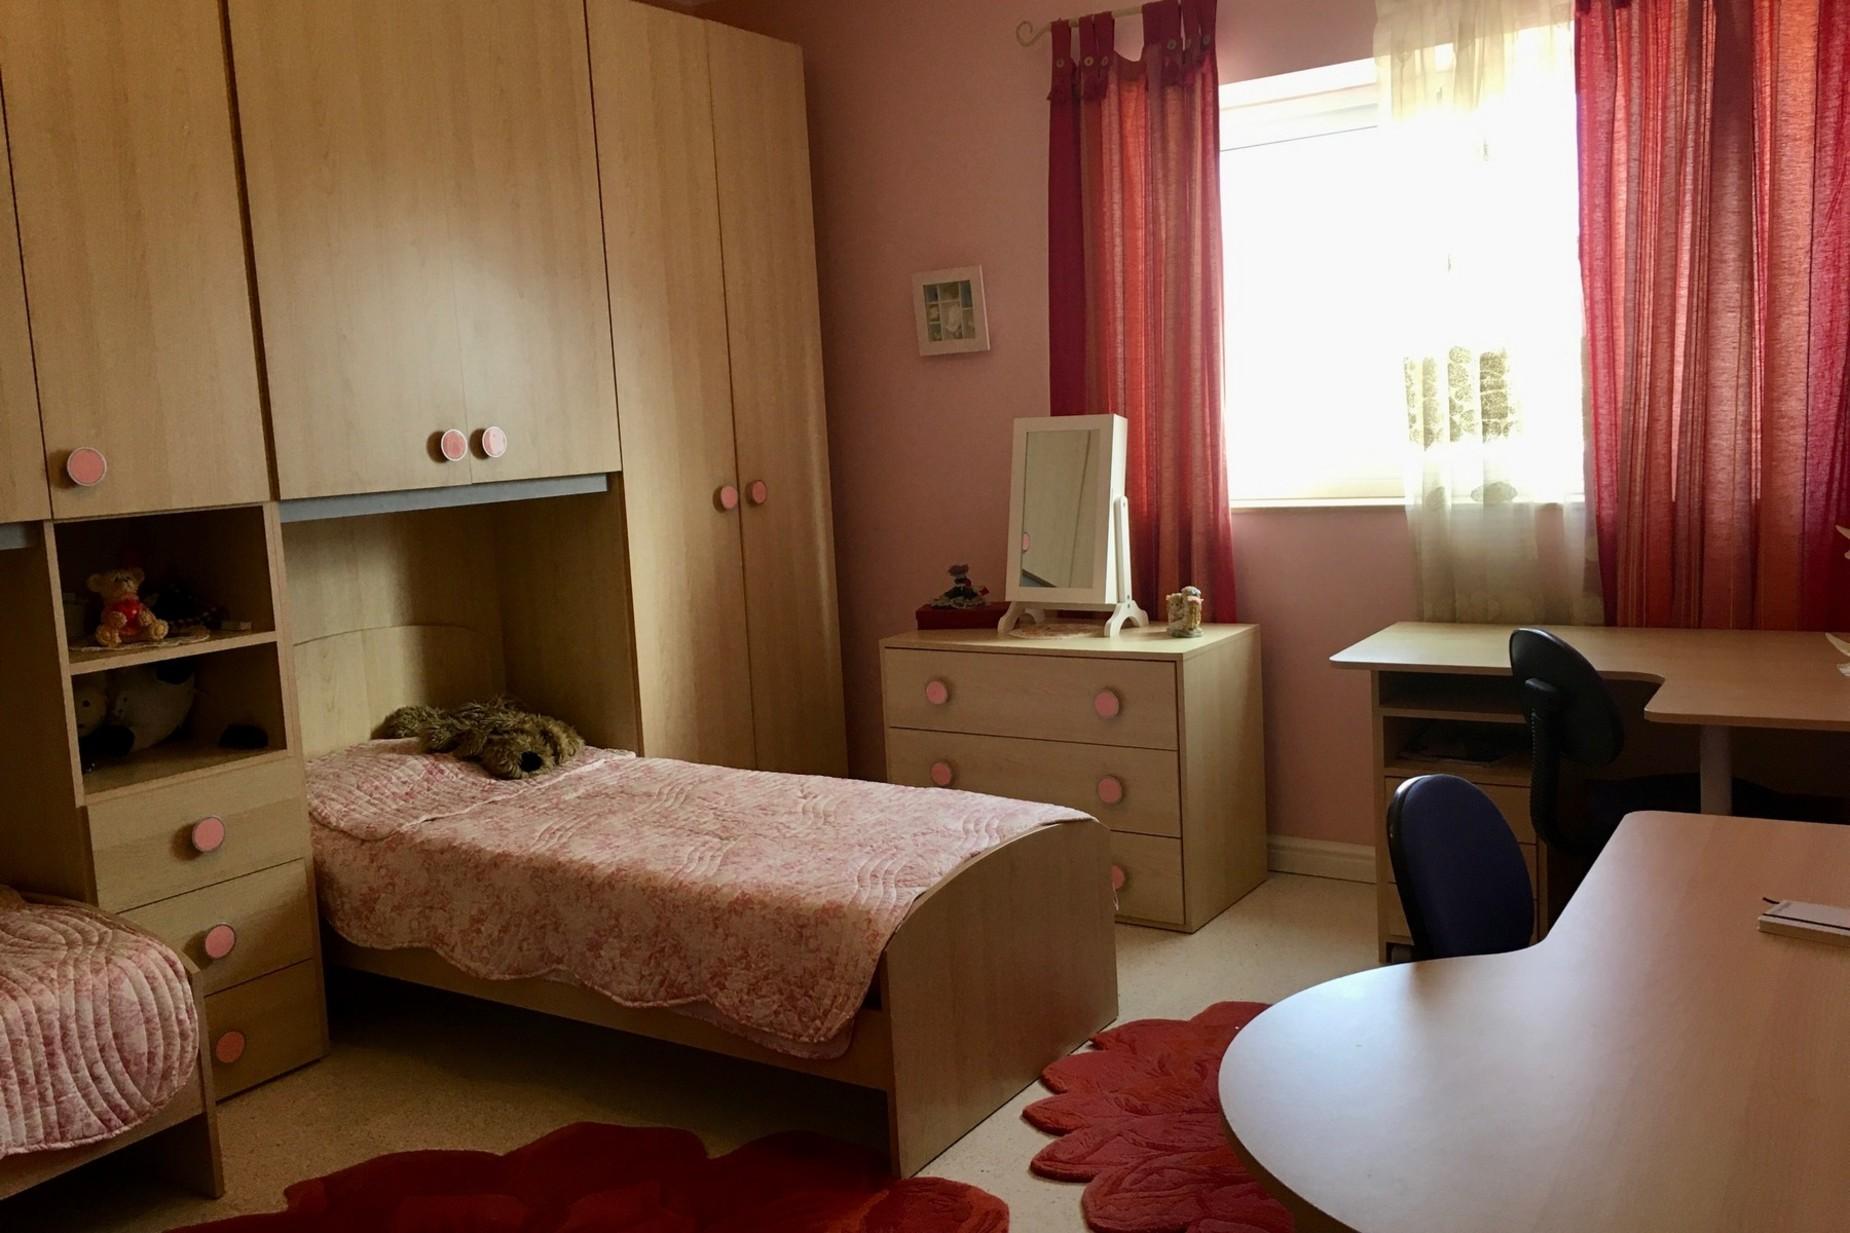 4 bed Villa For Sale in Qawra, Qawra - thumb 7